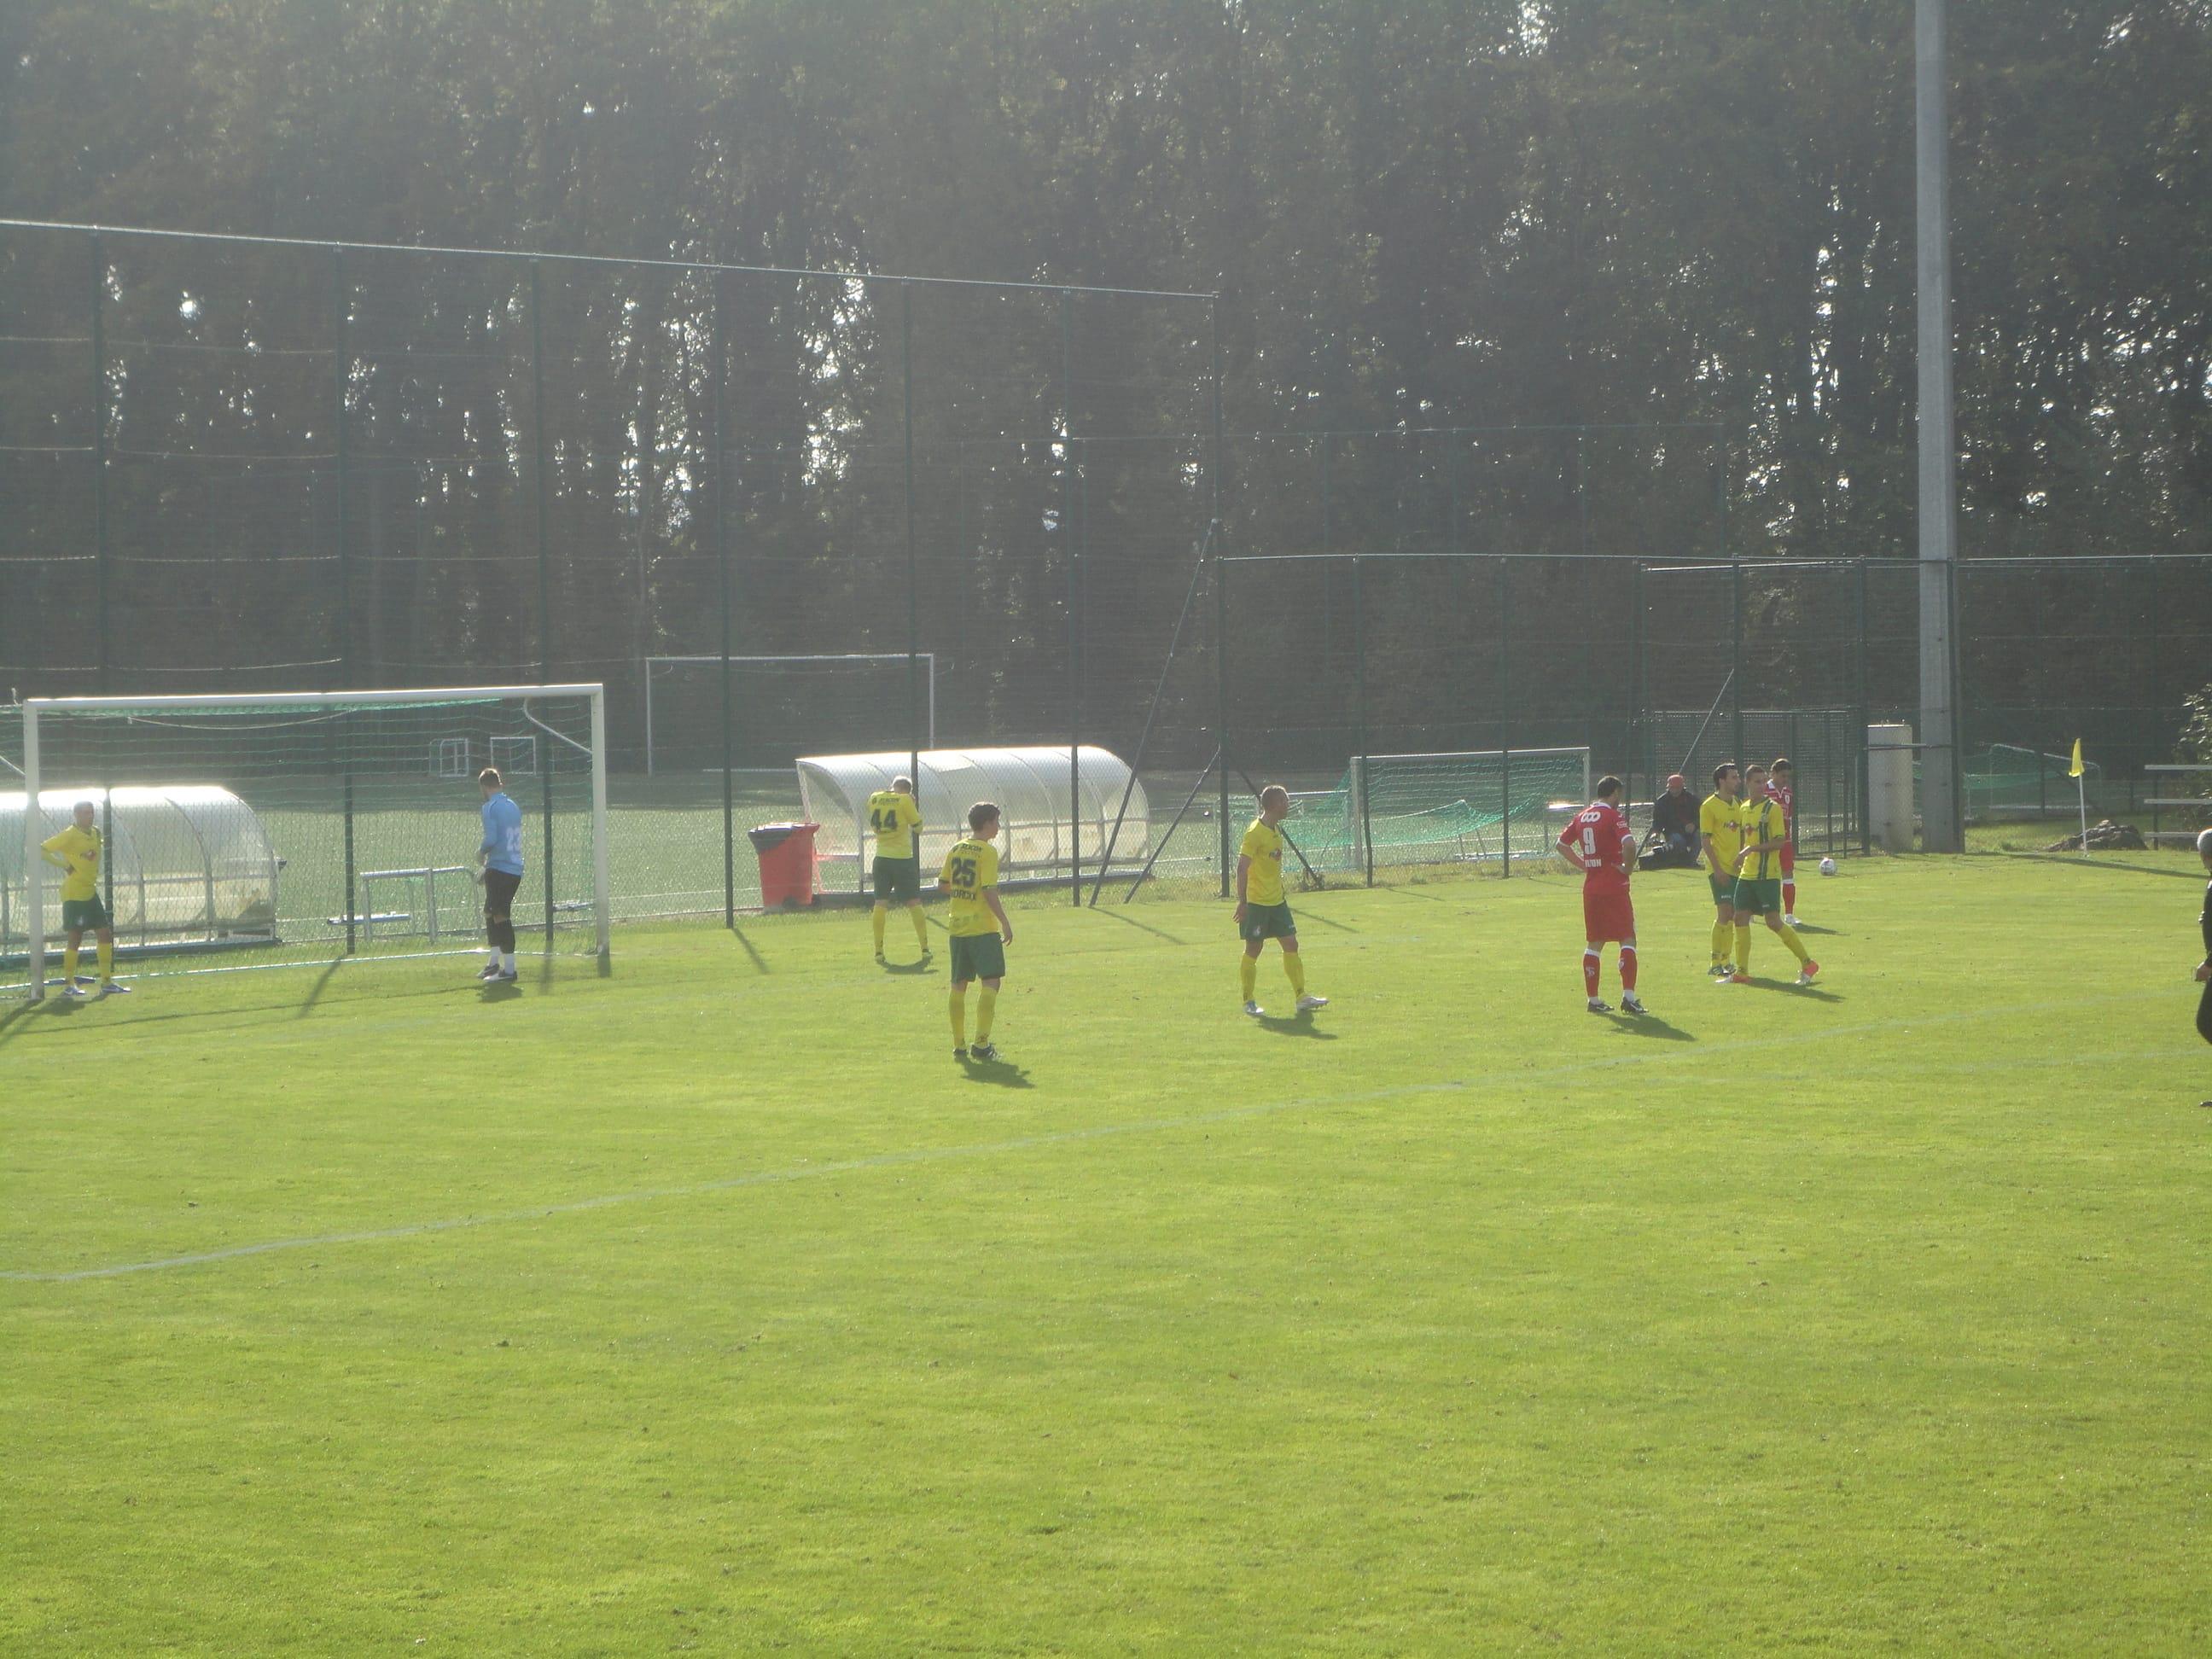 Standard de Liège 1 Fortuna Sittard 1